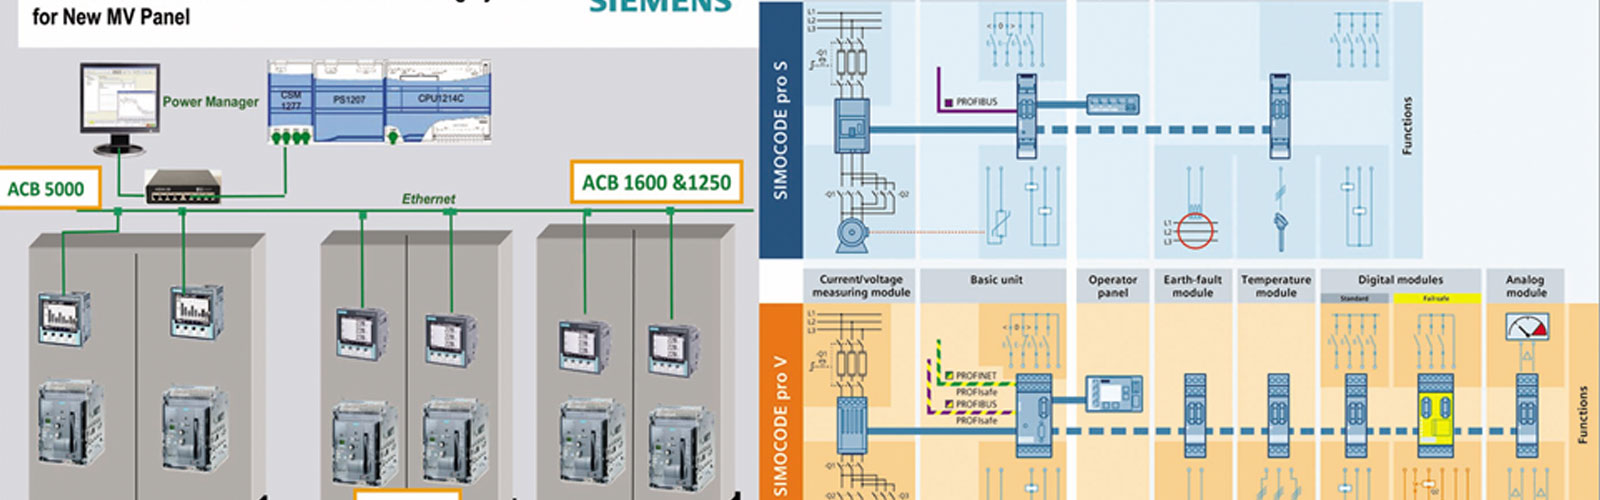 Energy-management-system